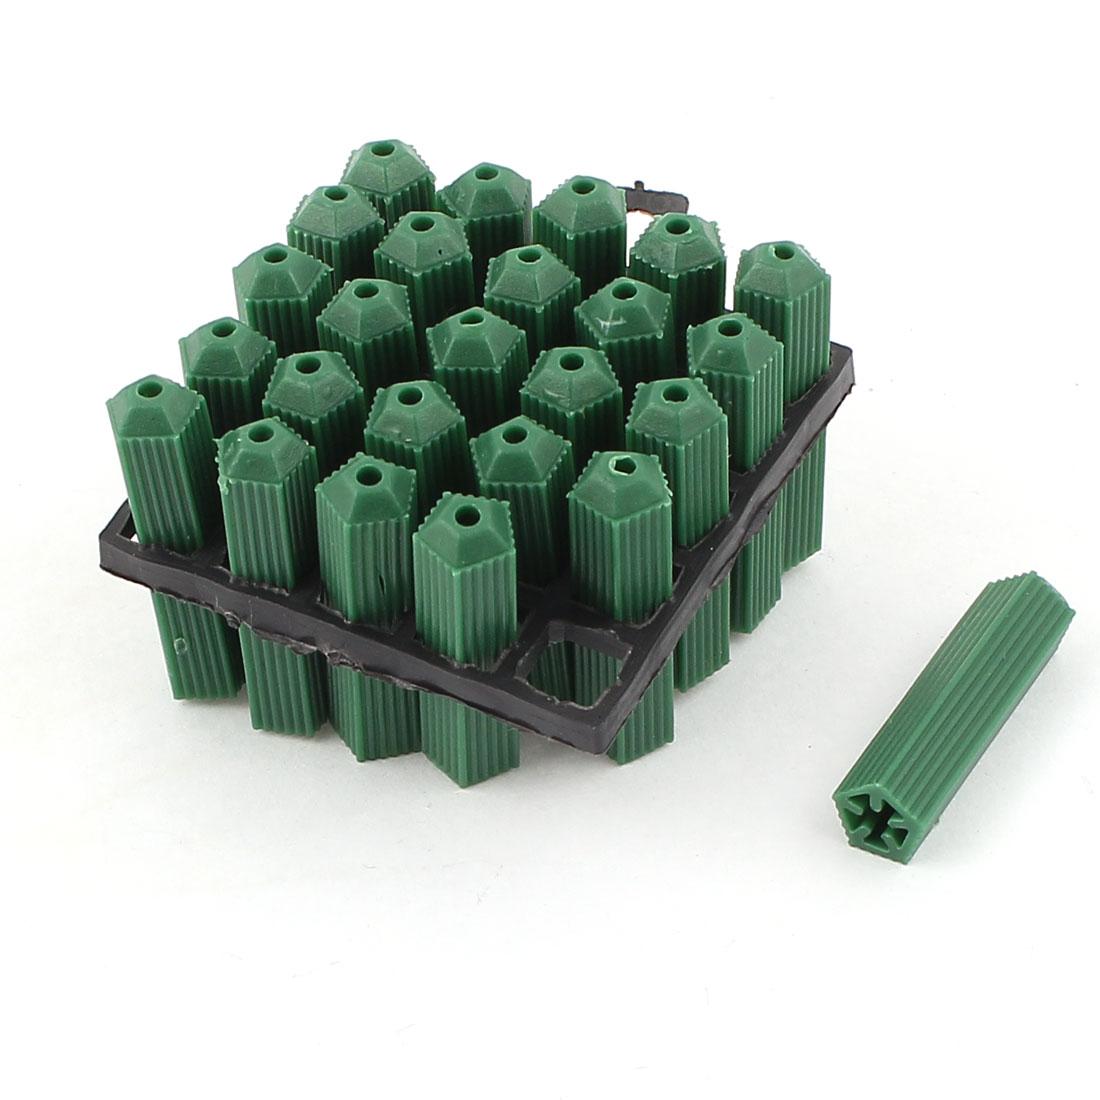 25 Pcs 3mm Green Anchor Nonslip Plastic Screw Fixing Wall Plugs Fasteners 27mm